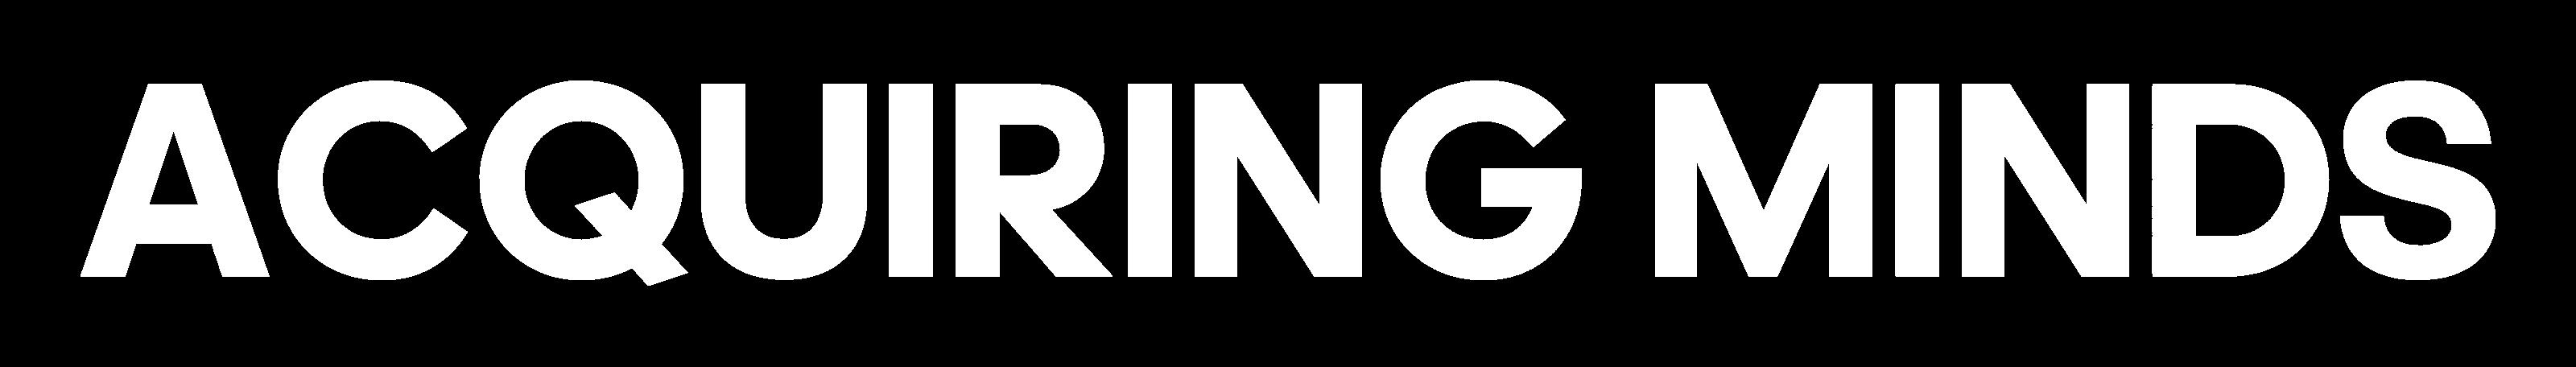 Acquiring Minds logo